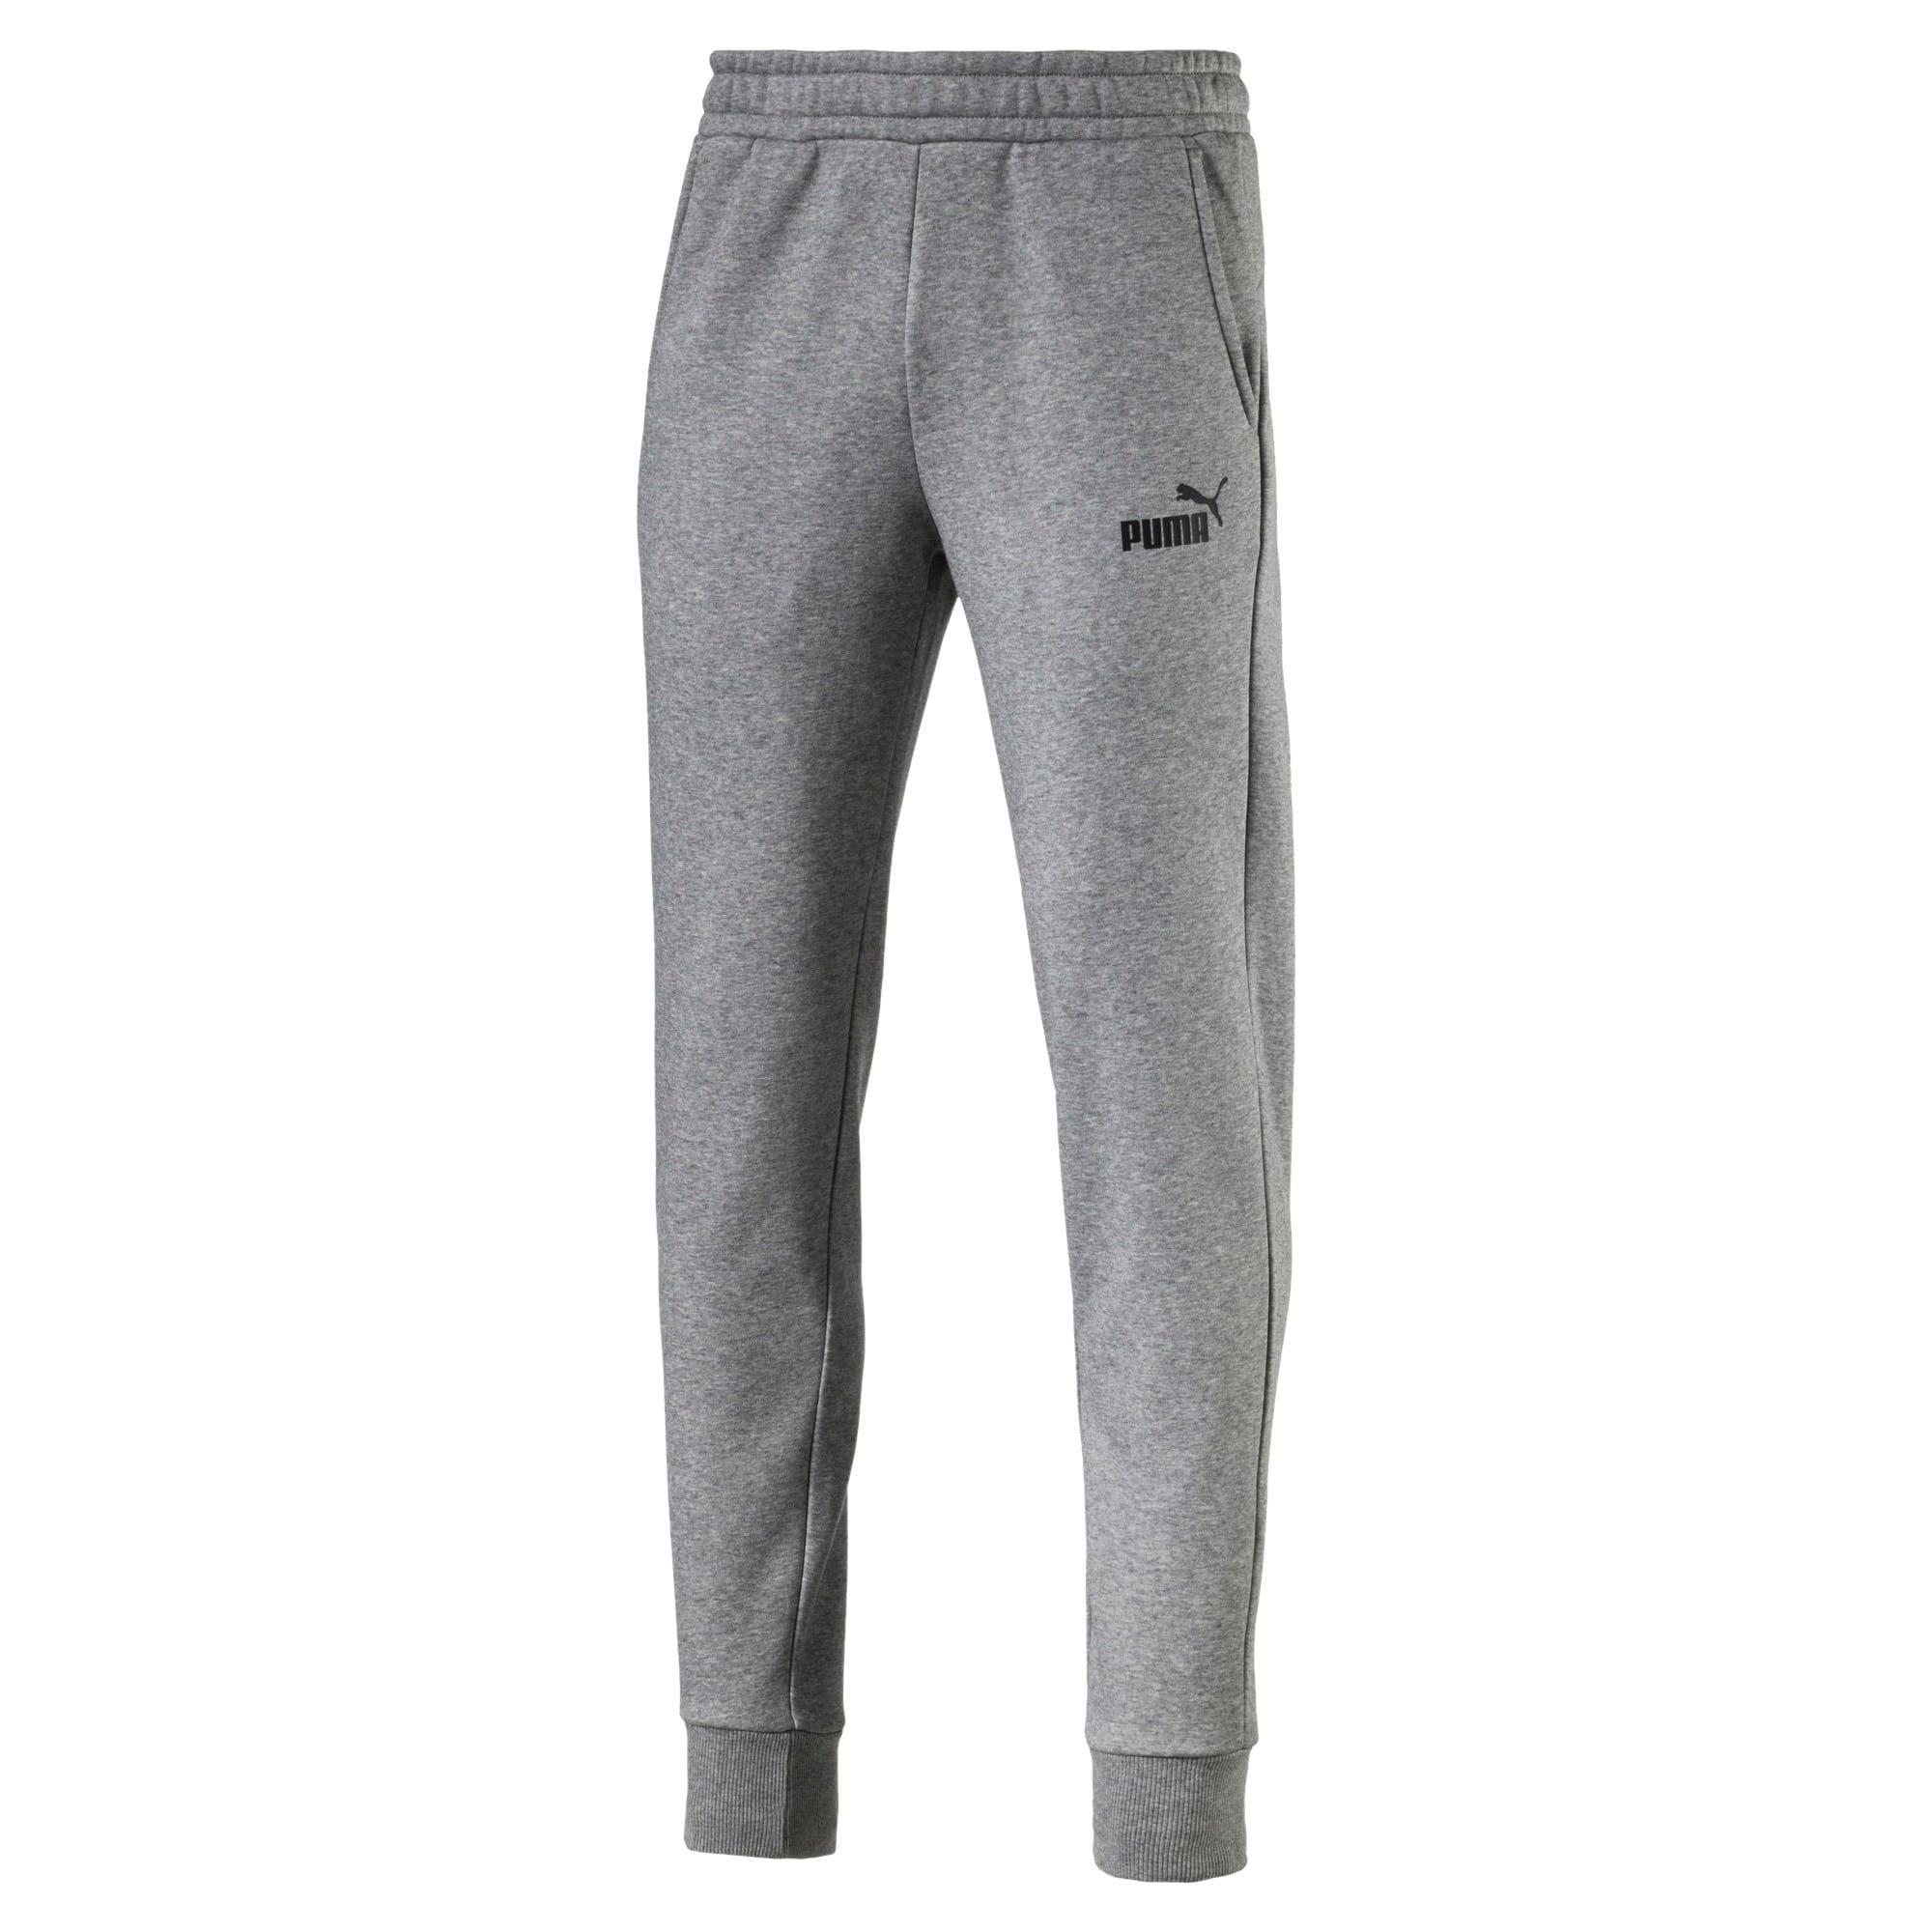 Thumbnail 1 of Essentials Men's Sweatpants, Medium Gray Heather, medium